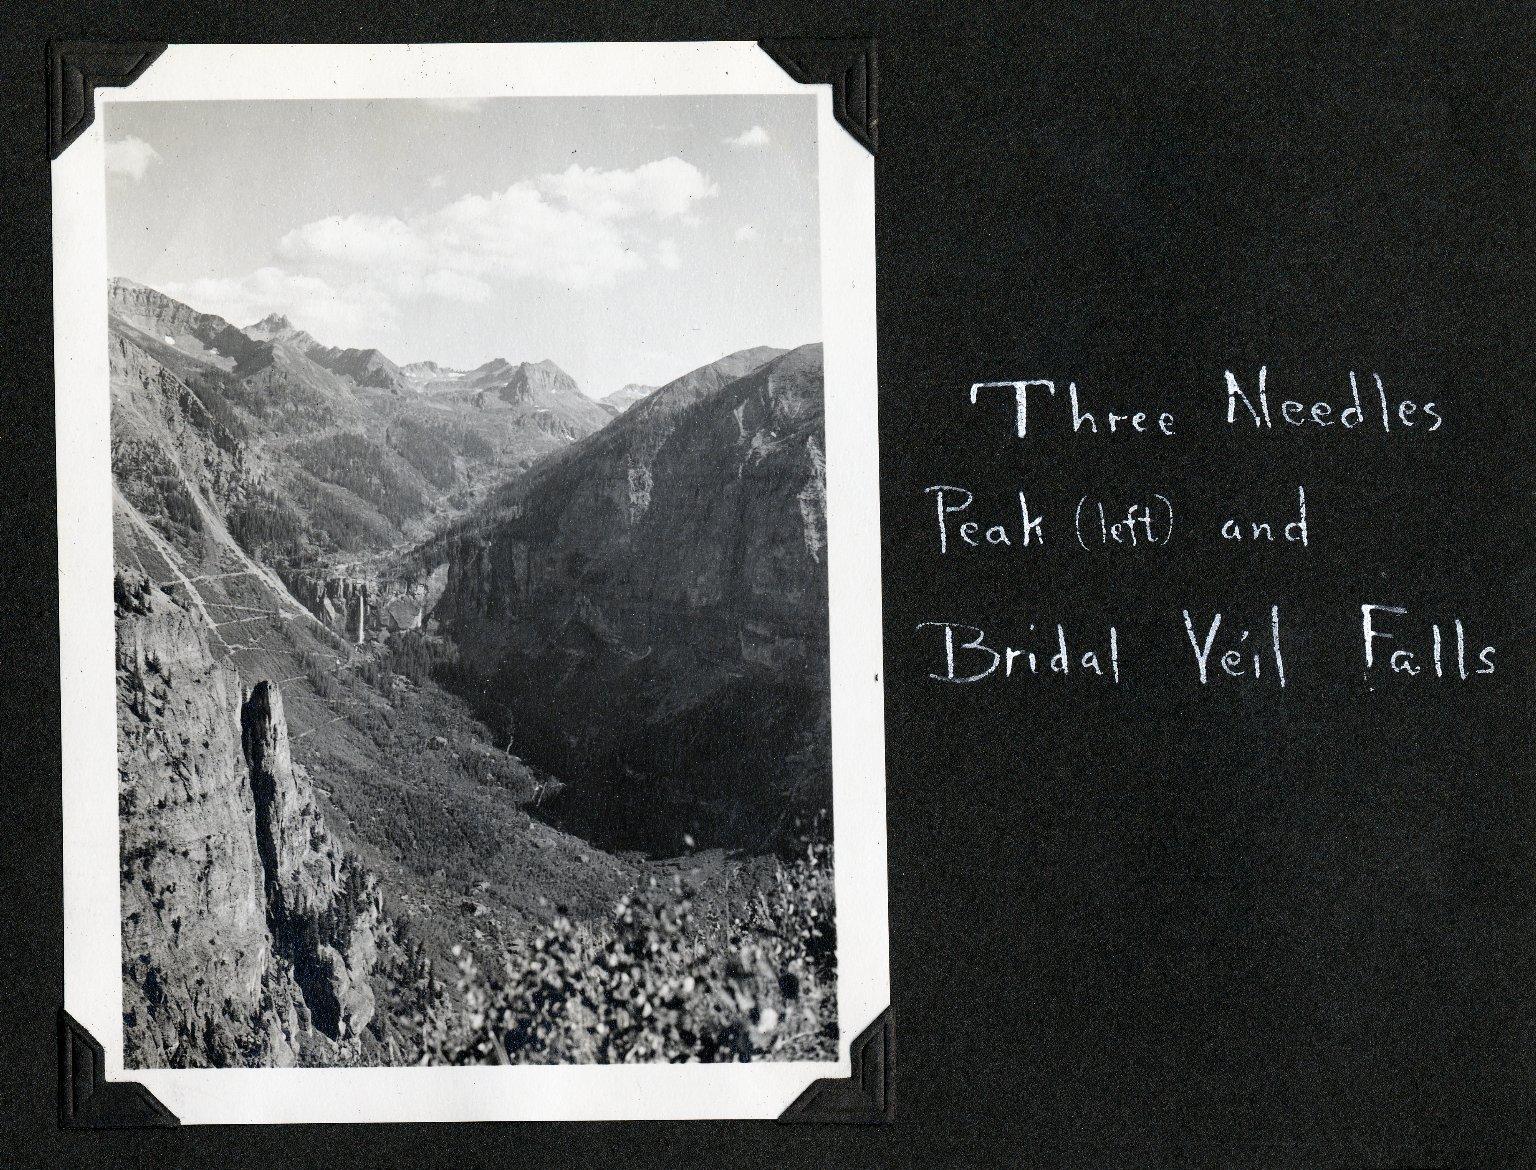 Three Nedles Peak (left) and Bridal Veil Falls